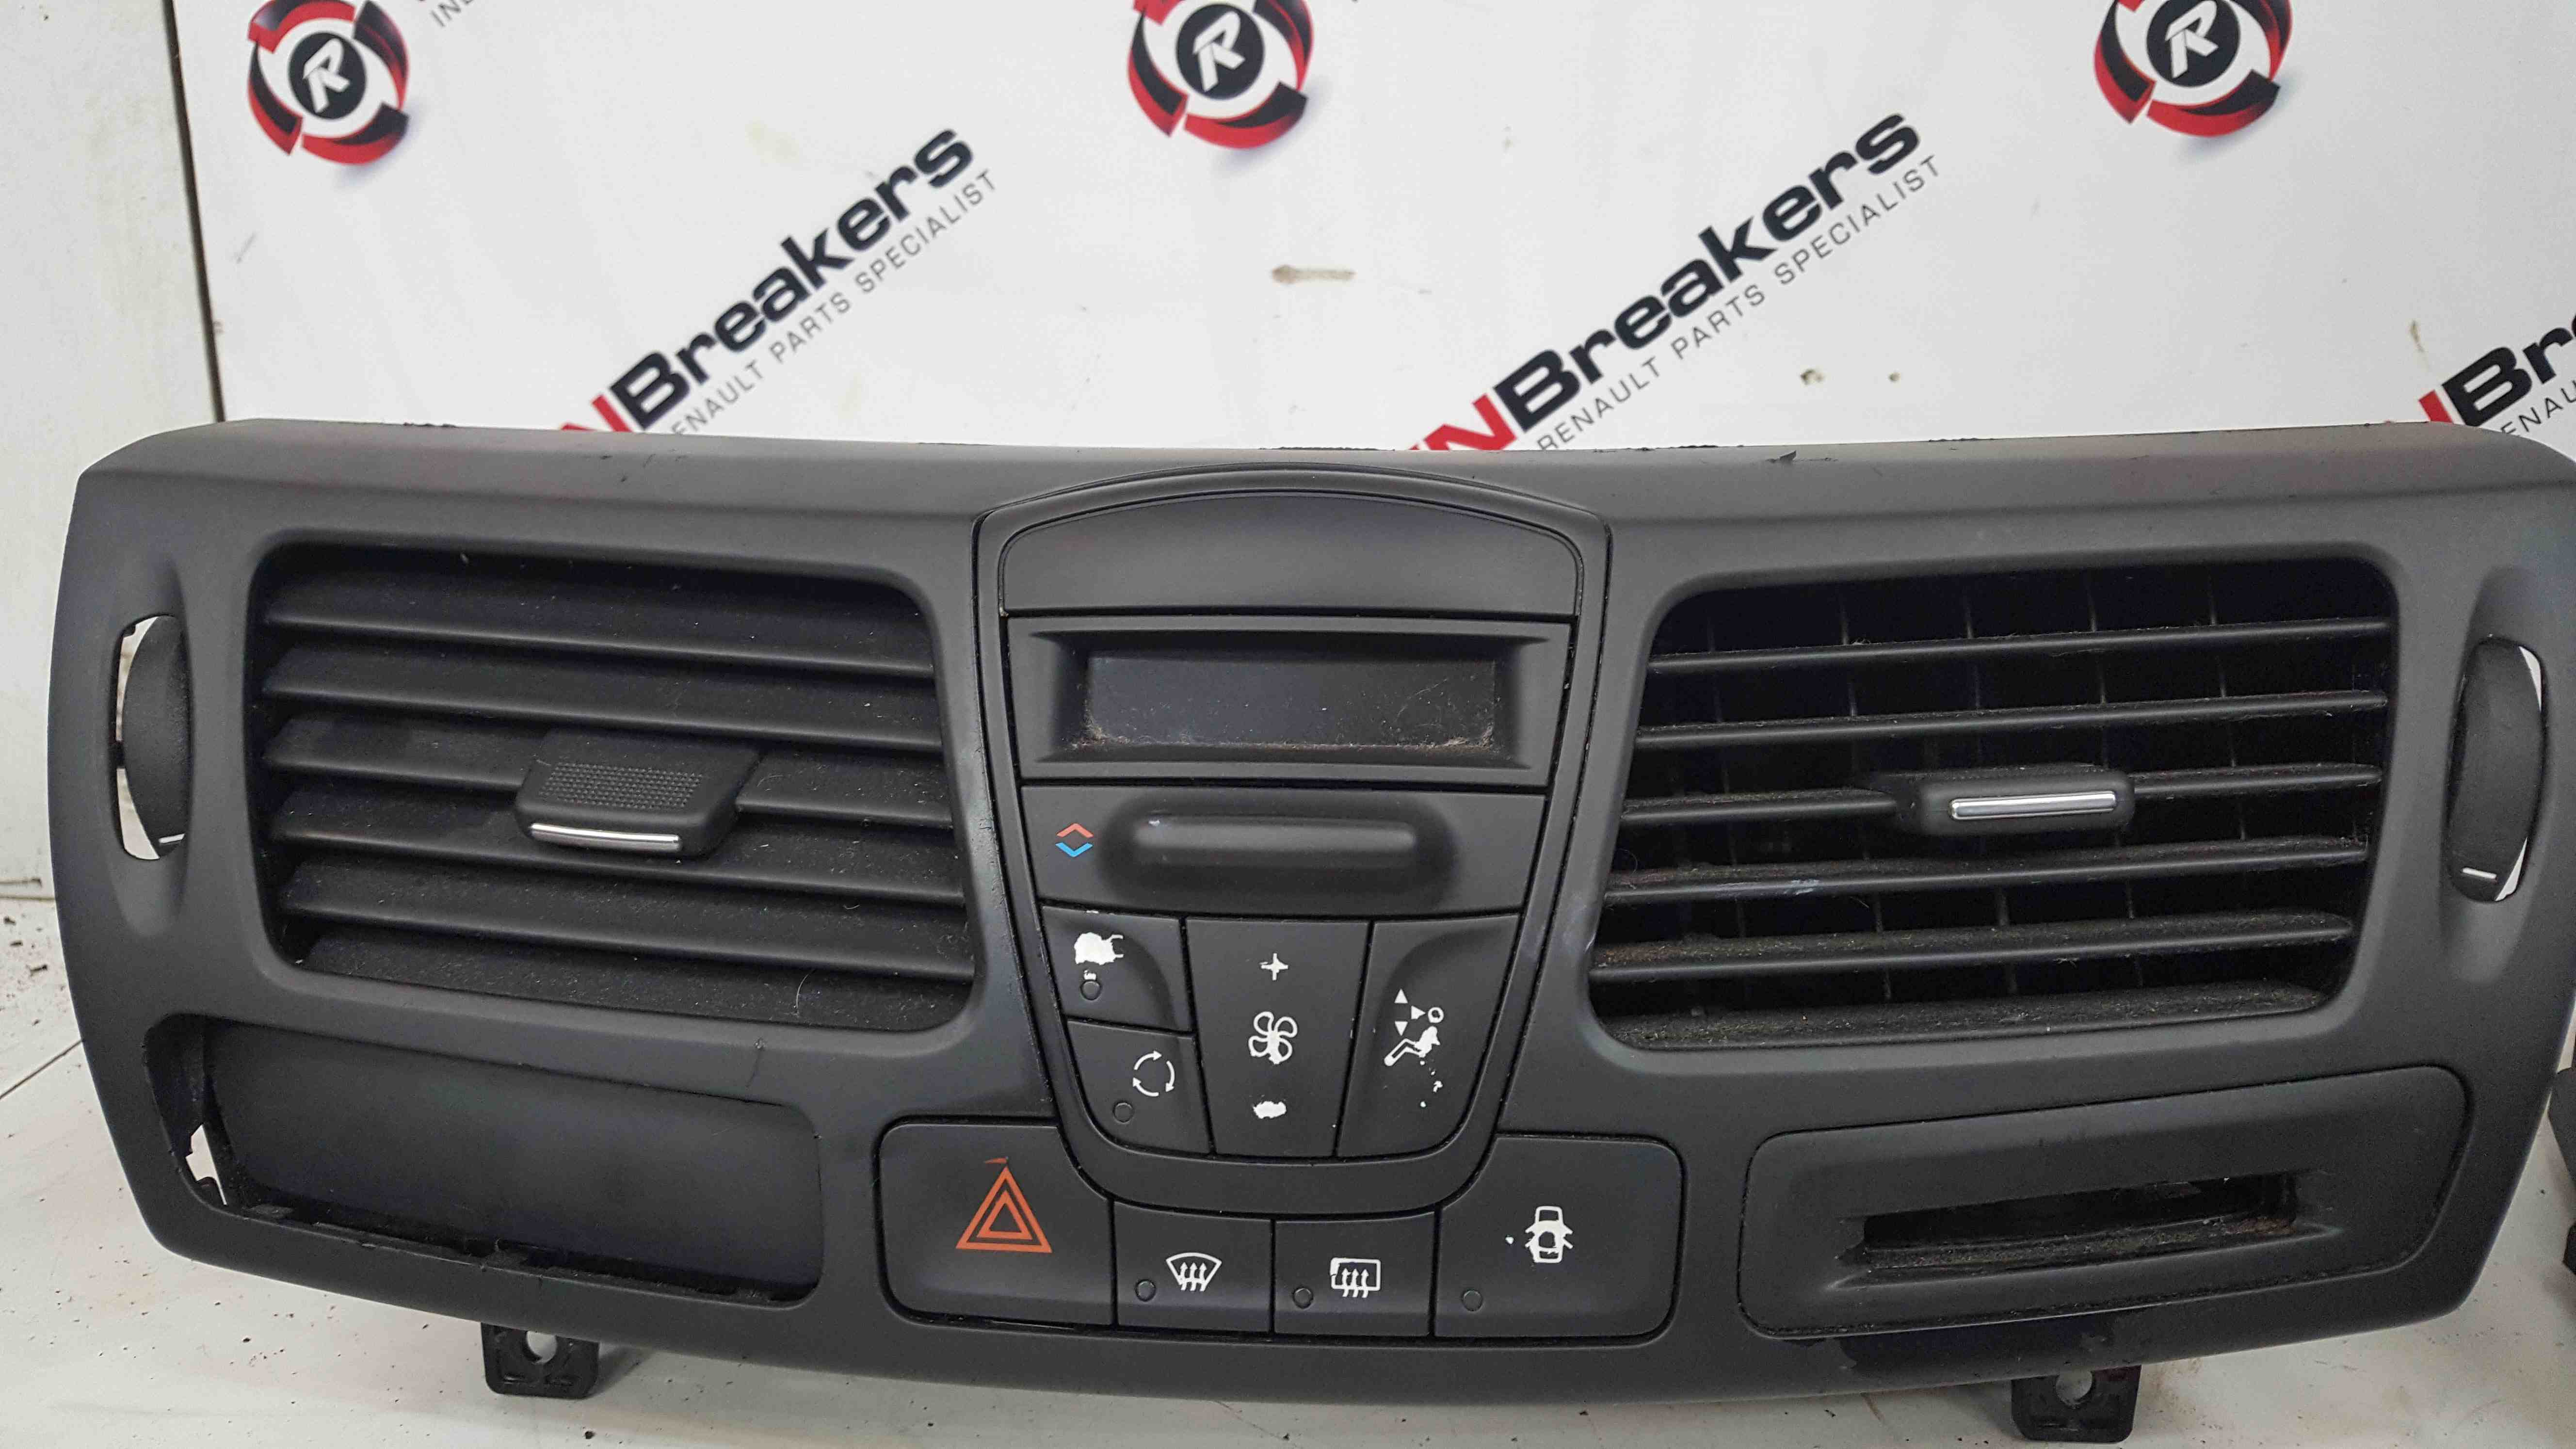 Renault Laguna MK3 2007-2012 Heater Vent Control Heater Panel Switches